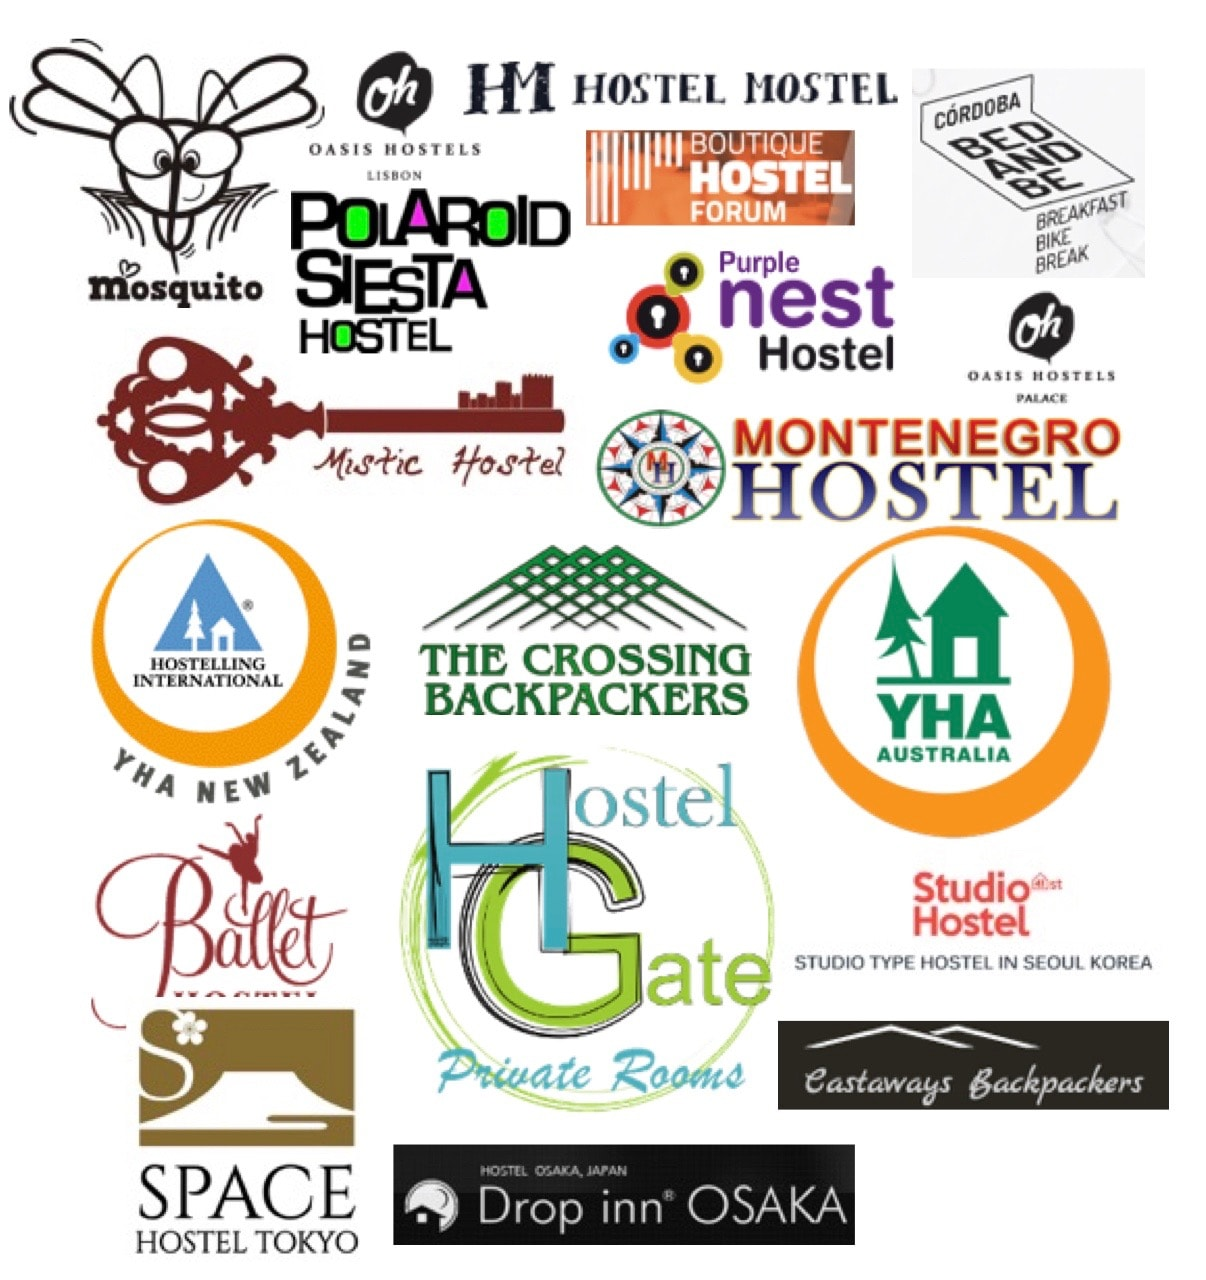 Hostel Partners